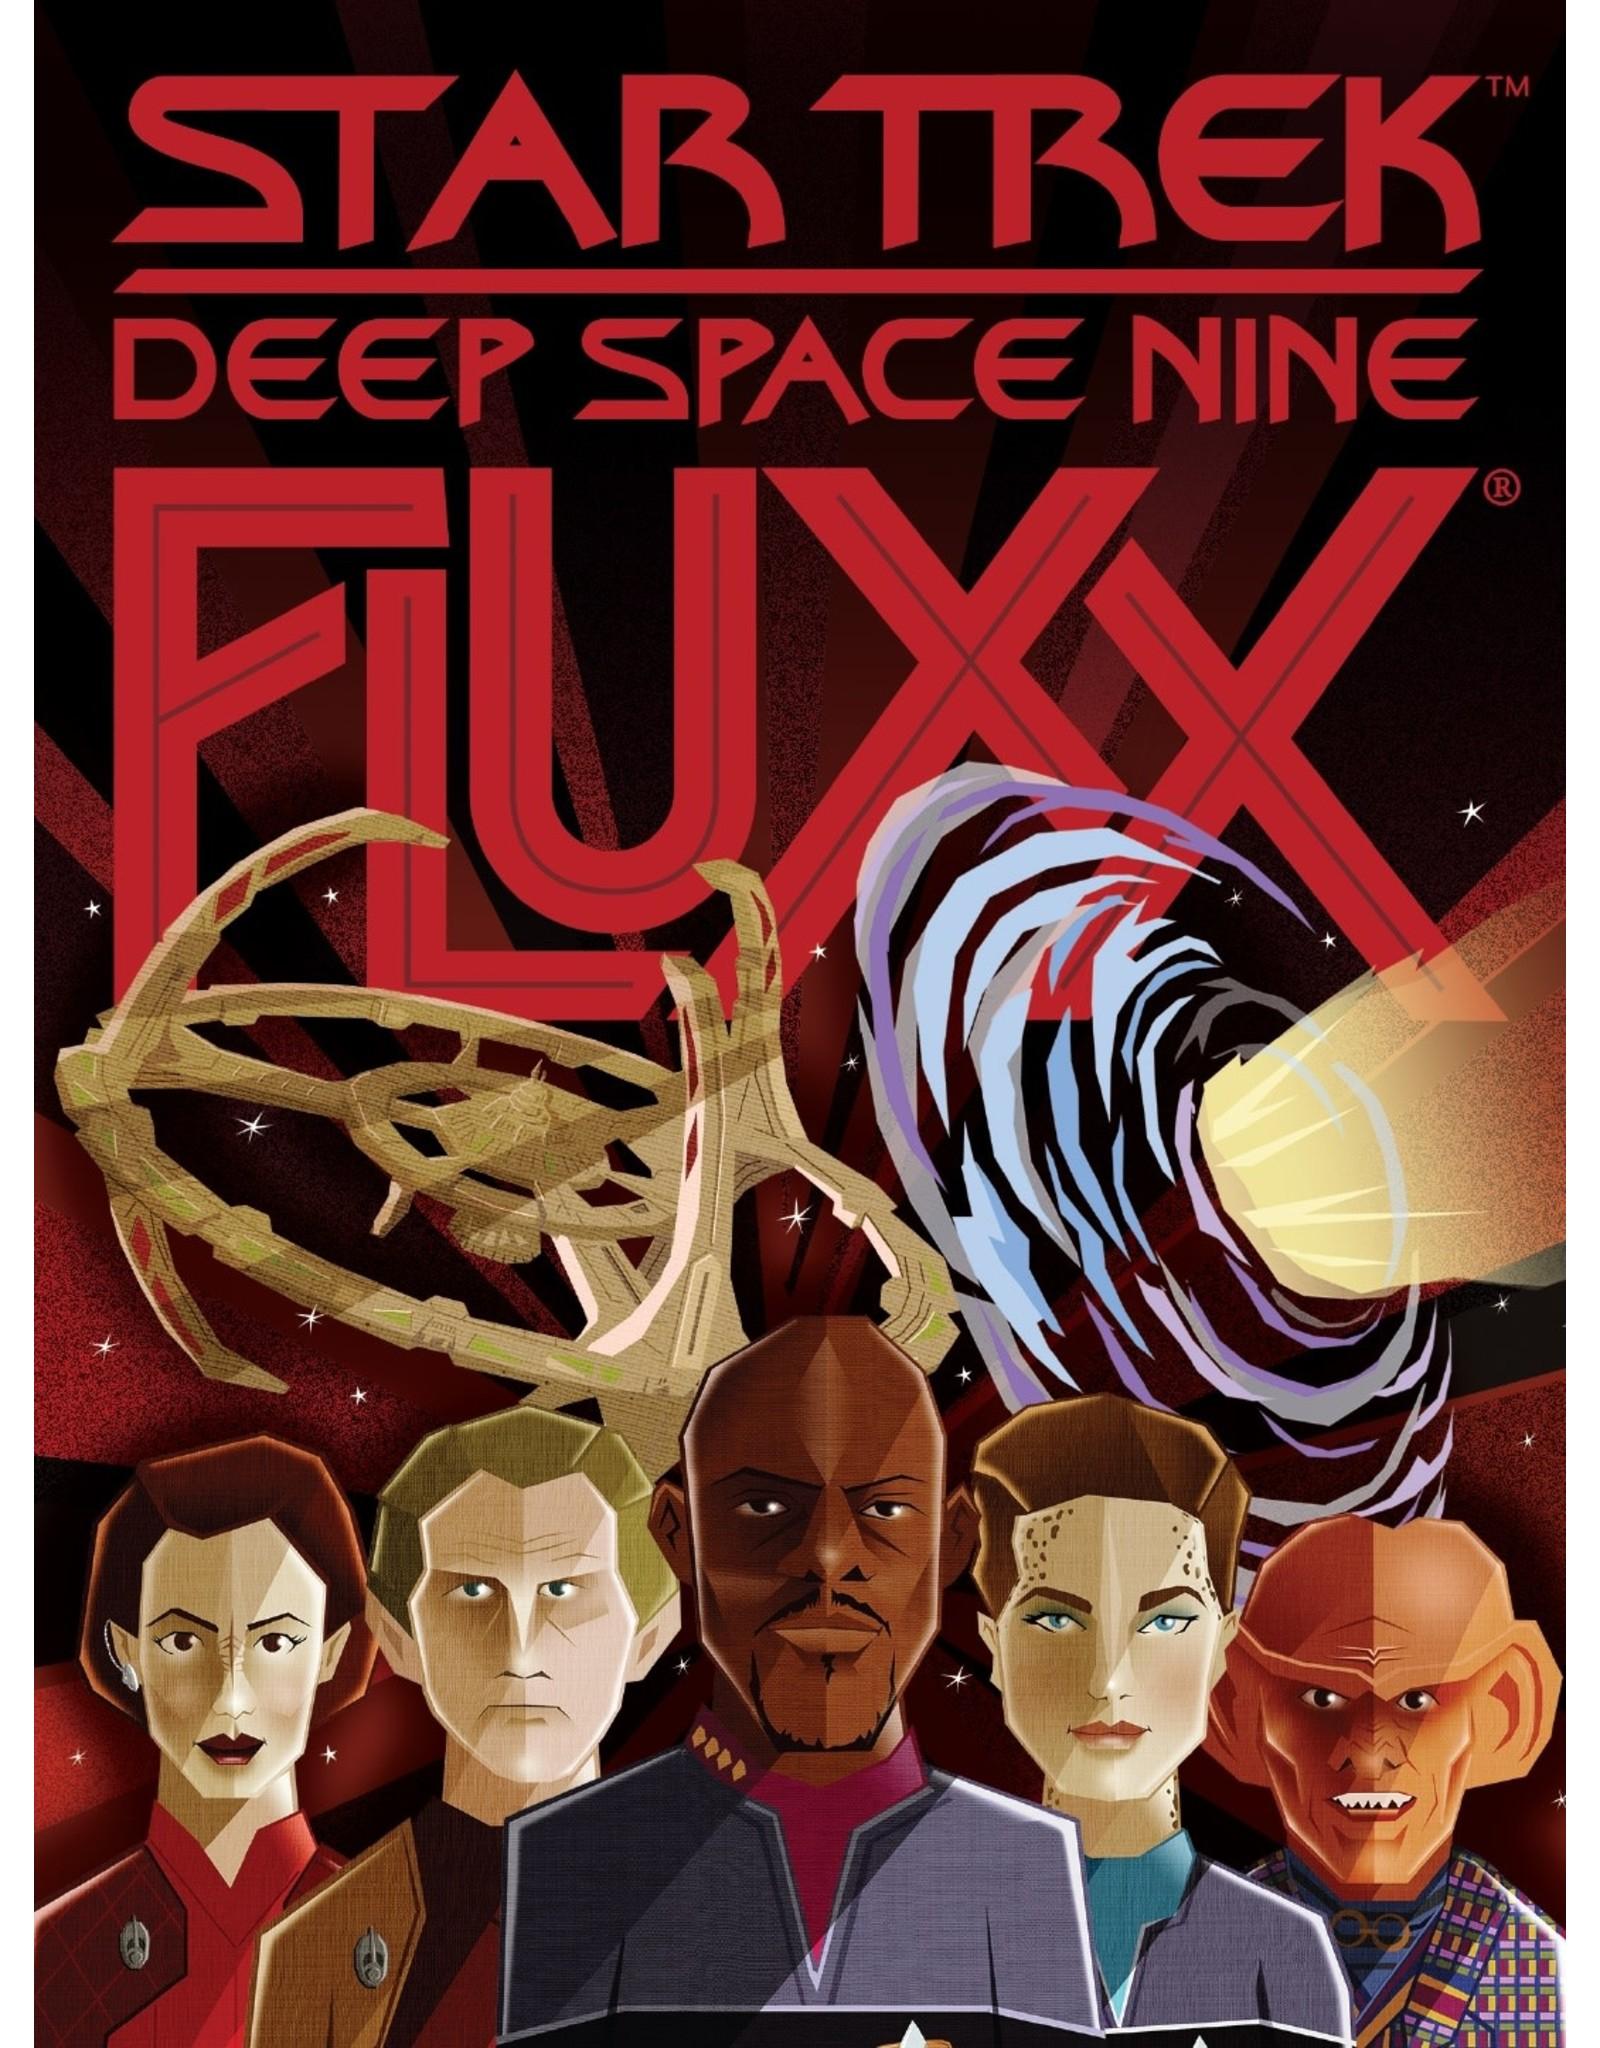 Looney Labs Star Trek: Deep Space Nine Fluxx